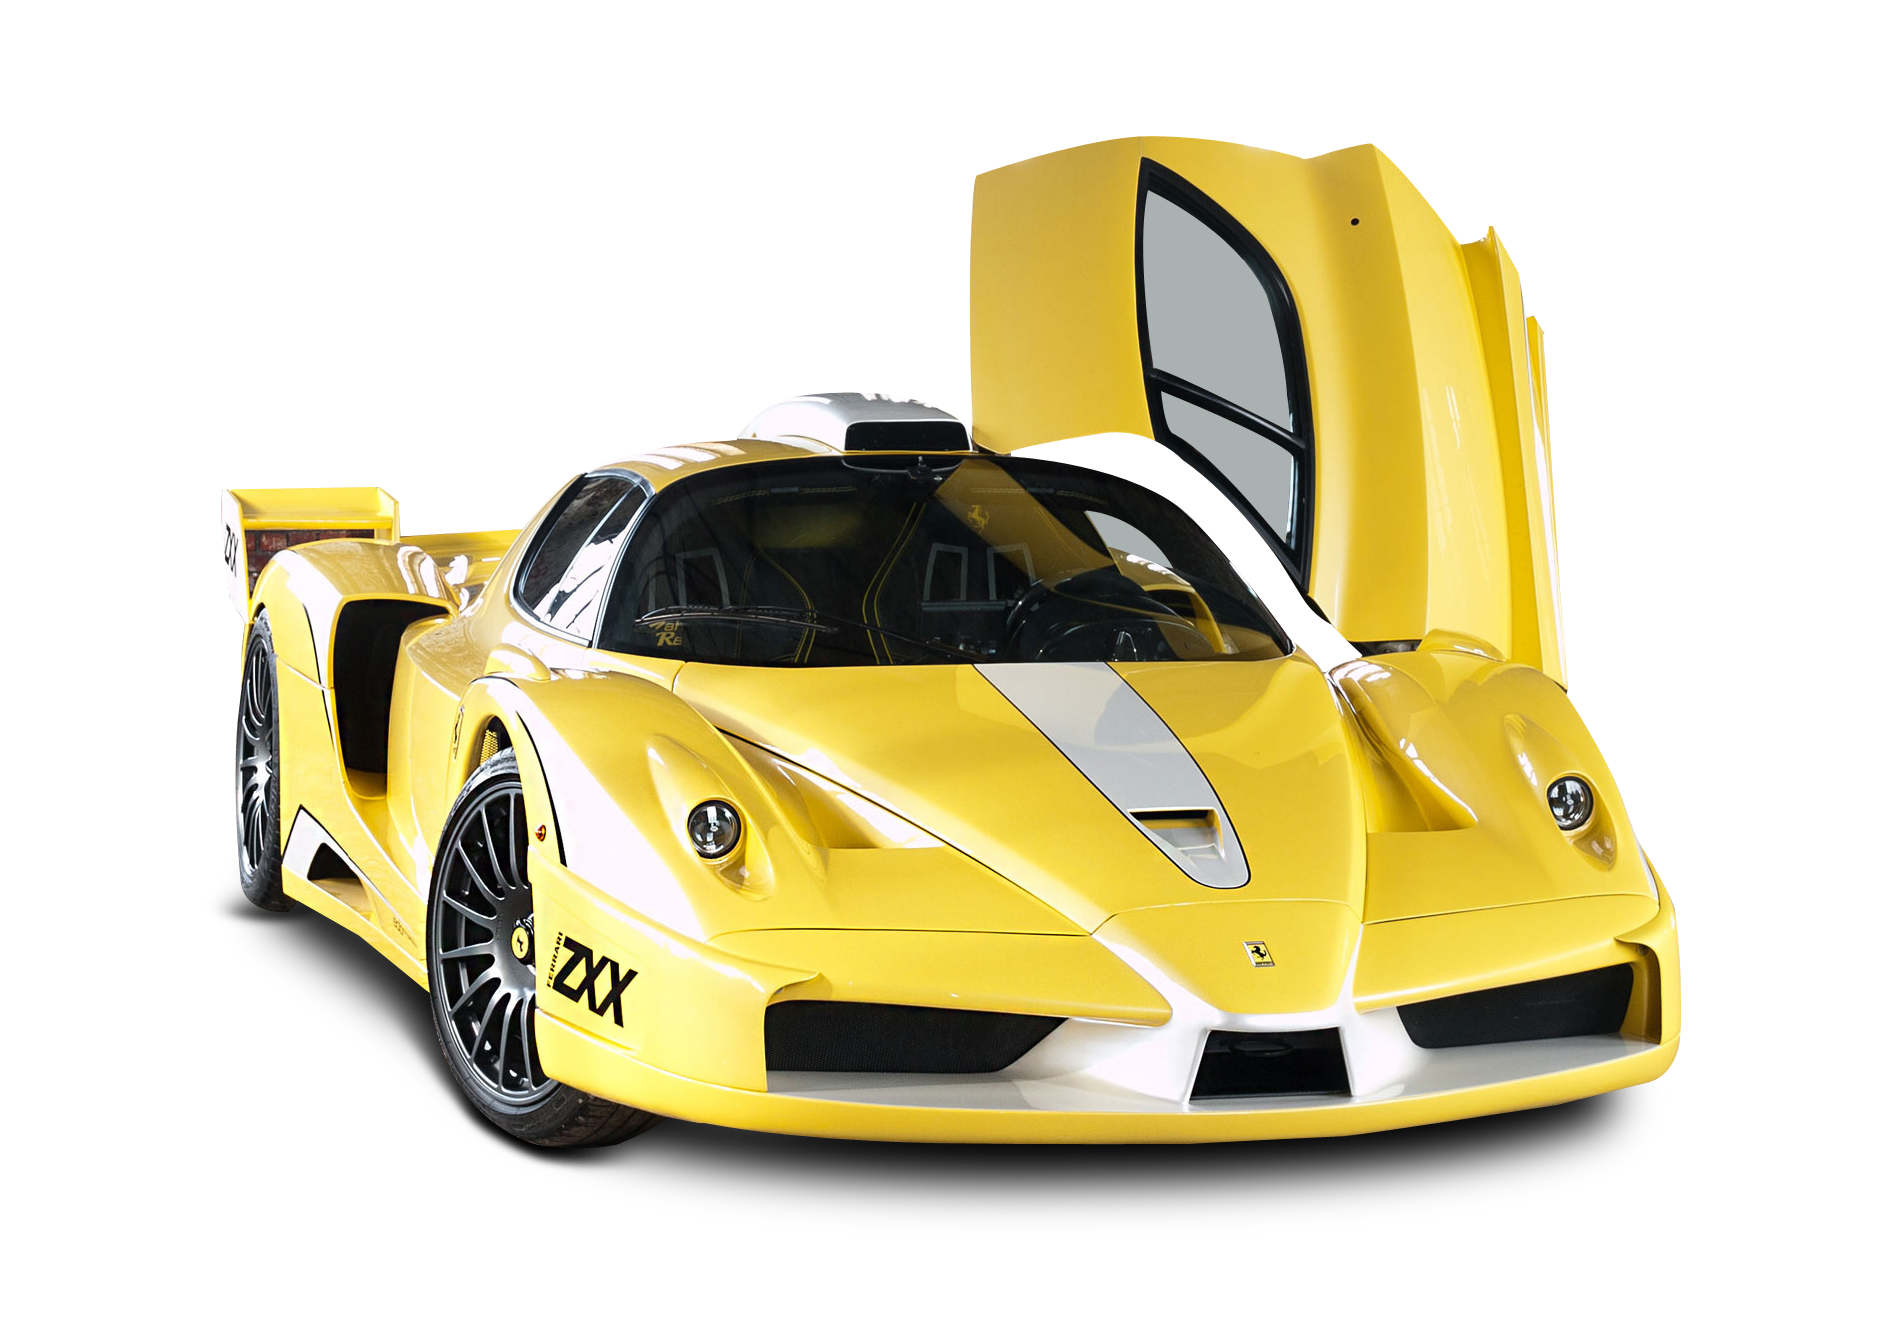 Yellow Ferrari Enzo Edo Car PNG Image